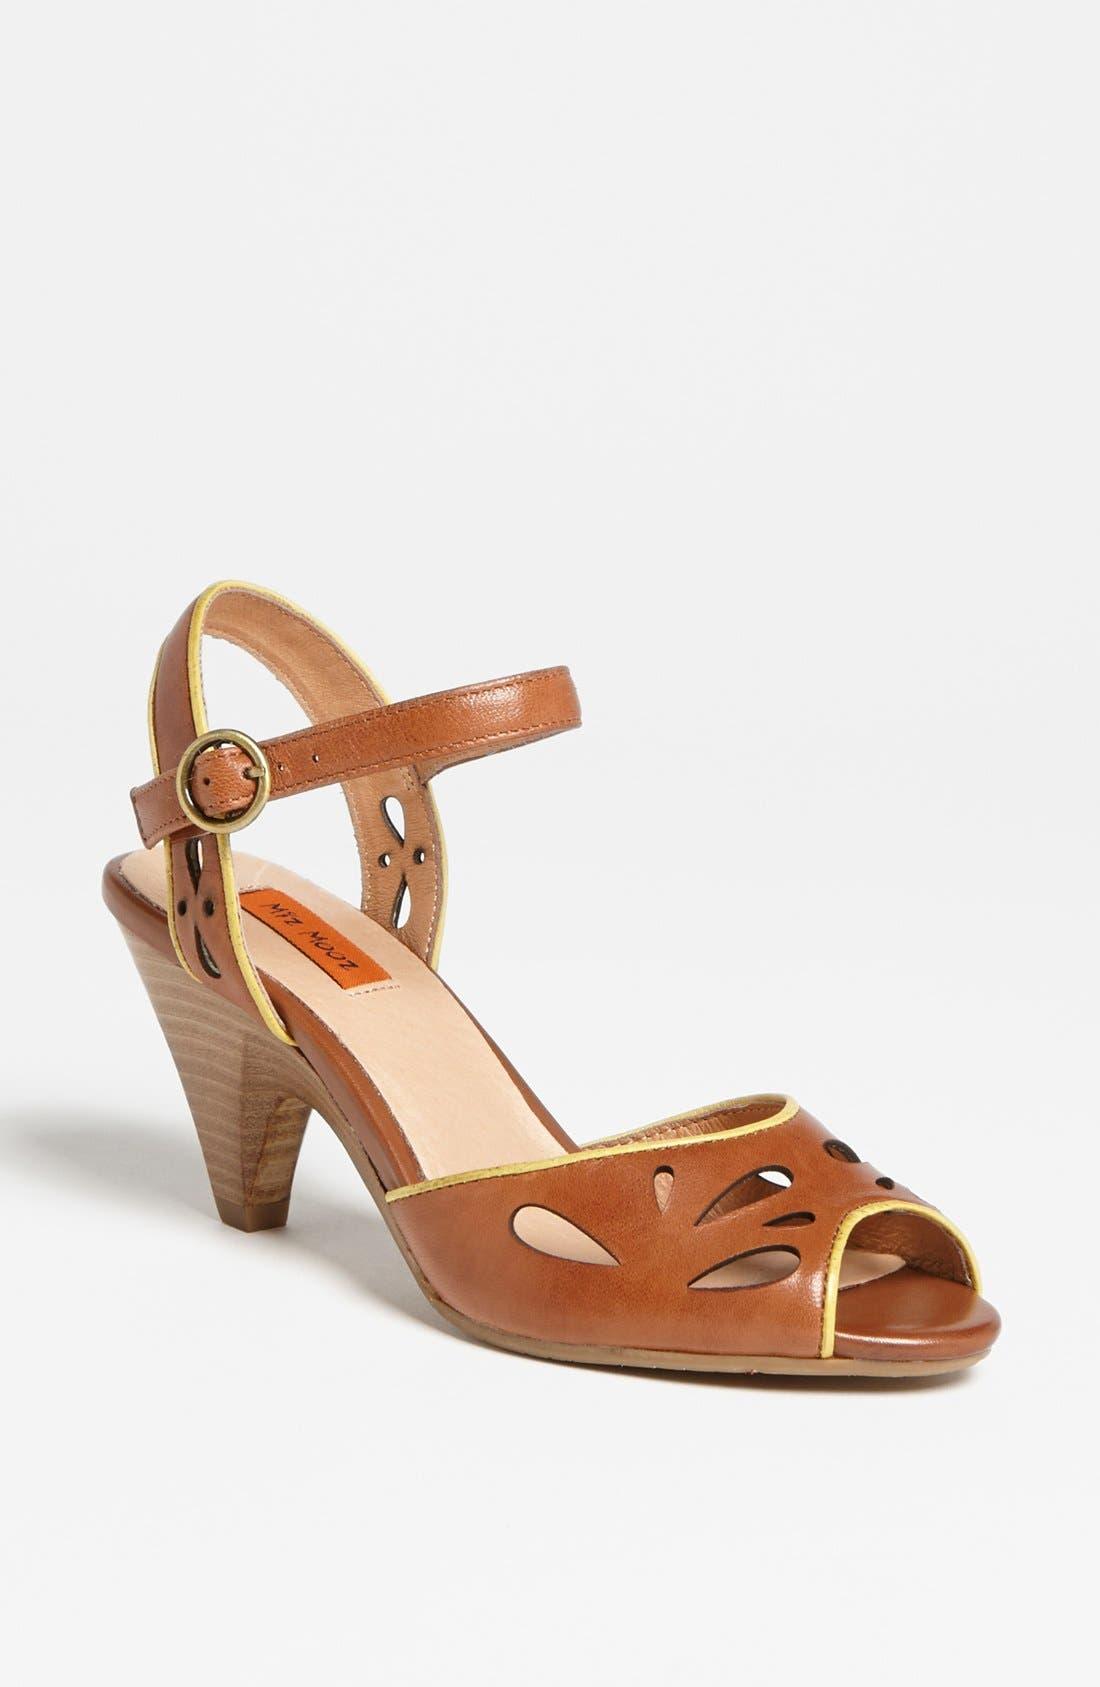 Alternate Image 1 Selected - Miz Mooz 'Wonder' Sandal